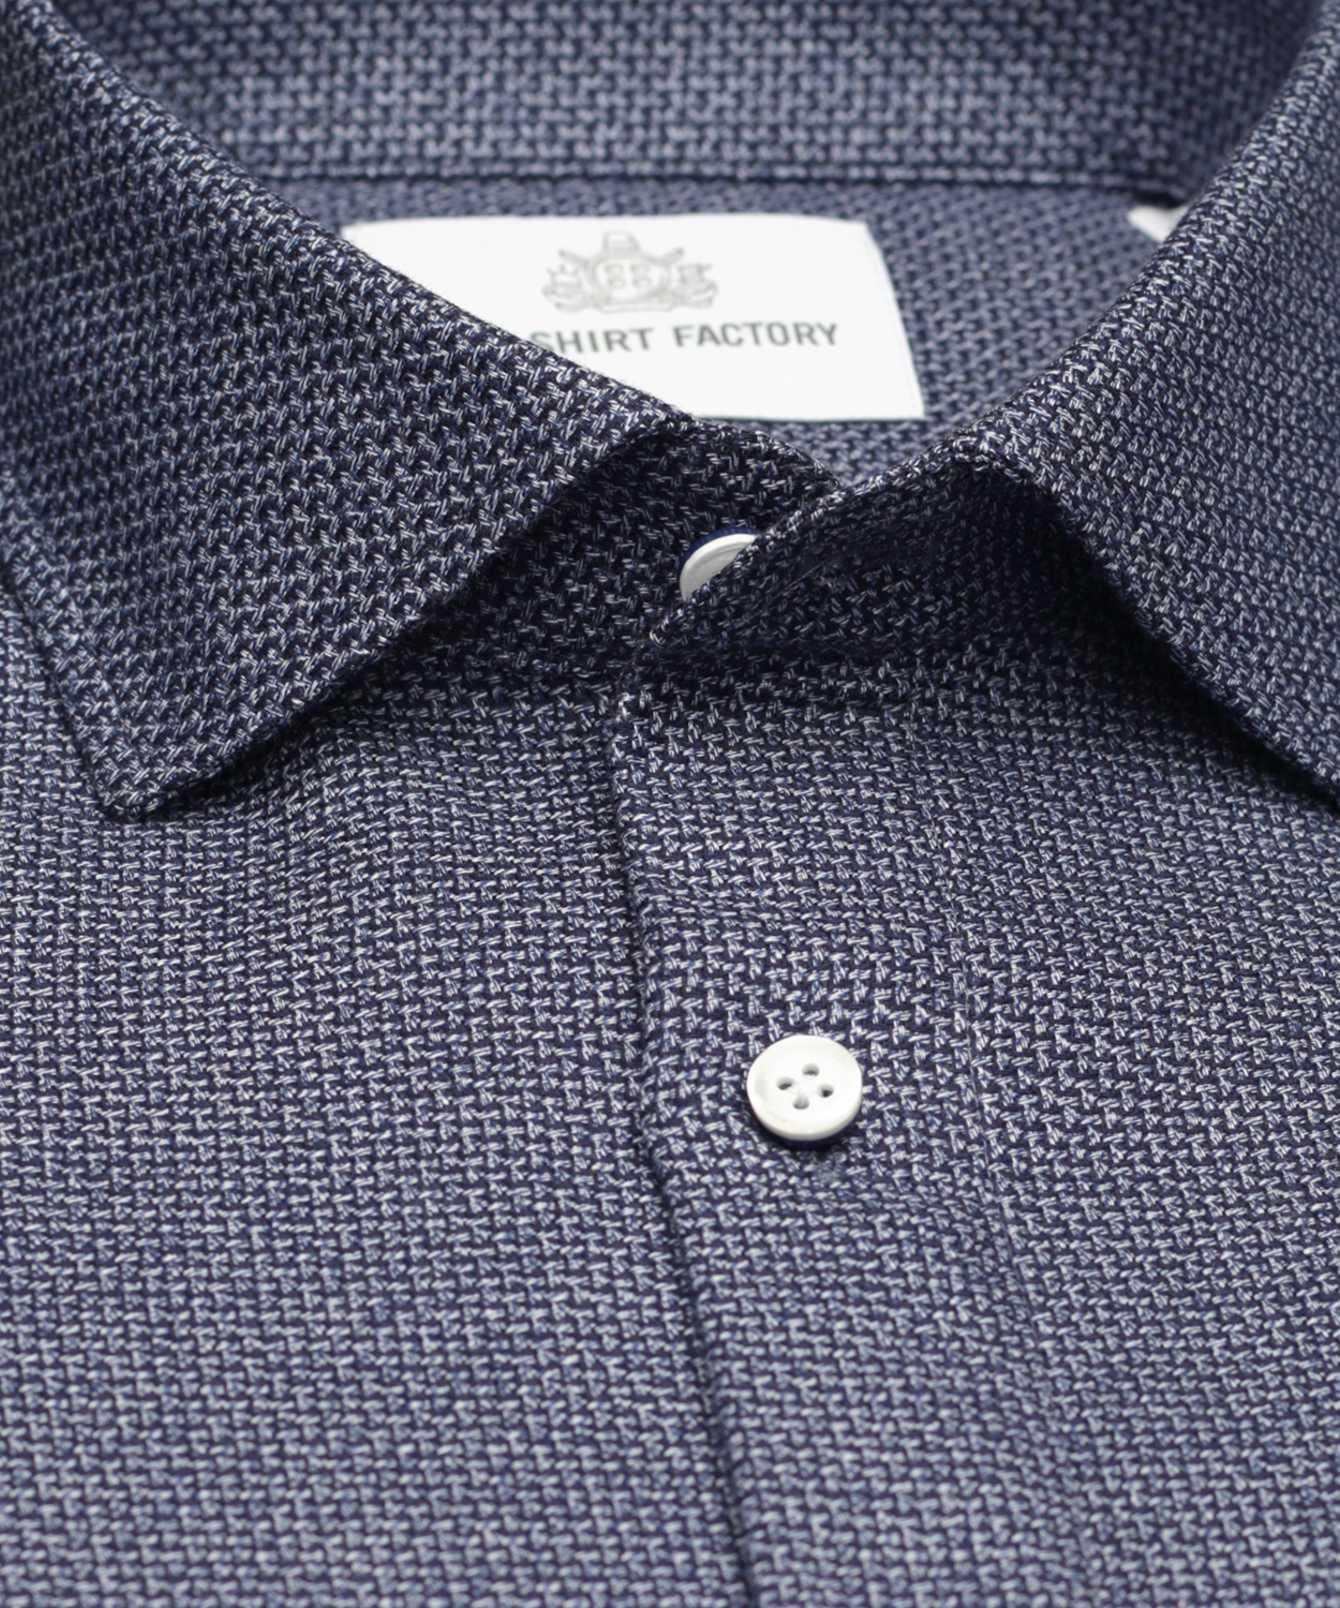 Shirt Nova Scotia Navy The Shirt Factory